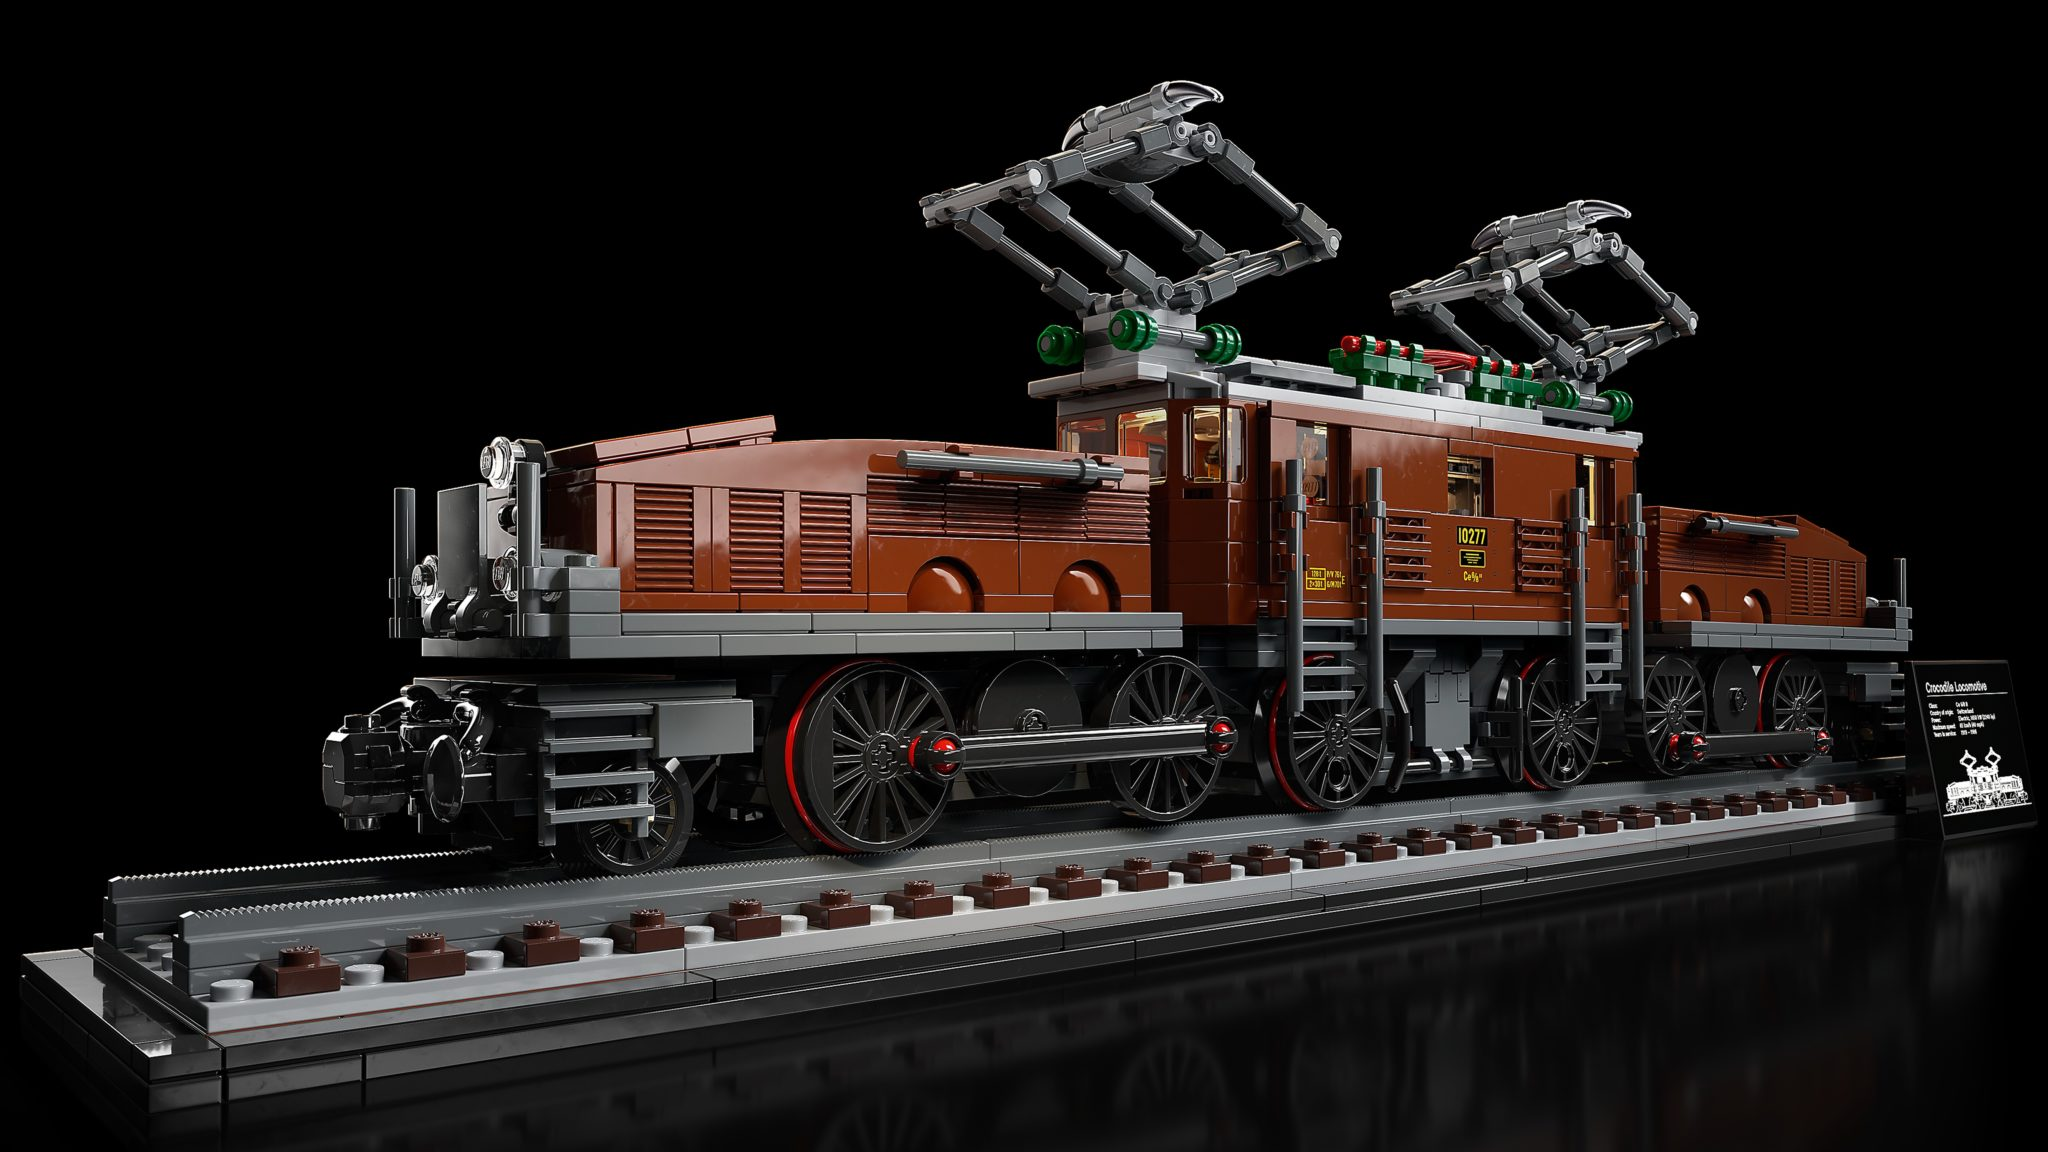 LTra034